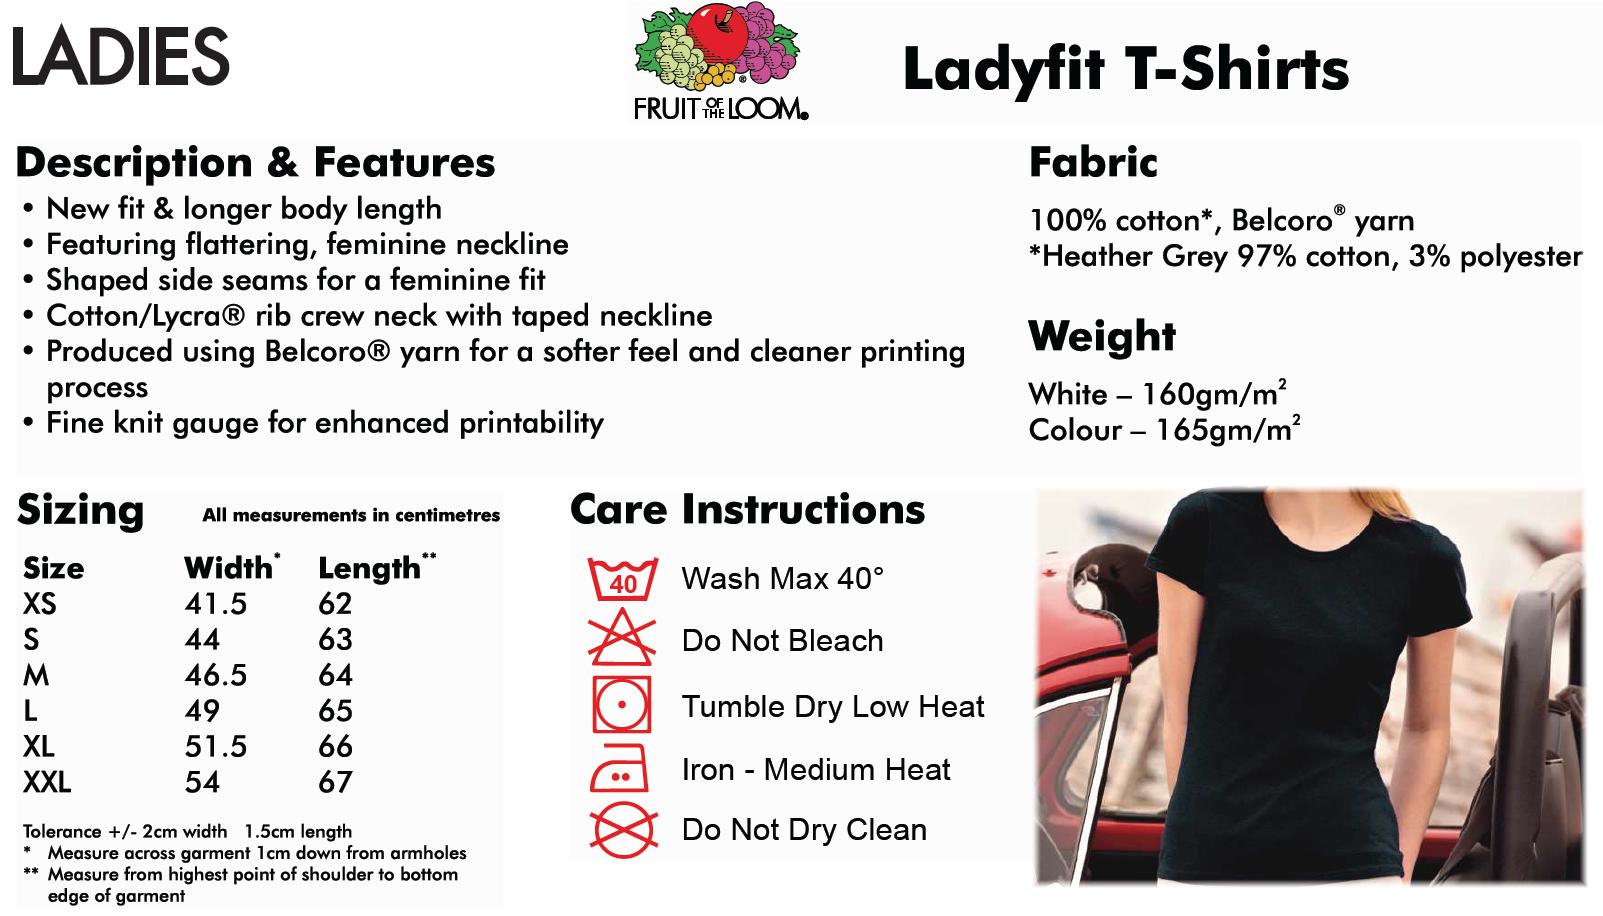 Ladyfit T-shirt info